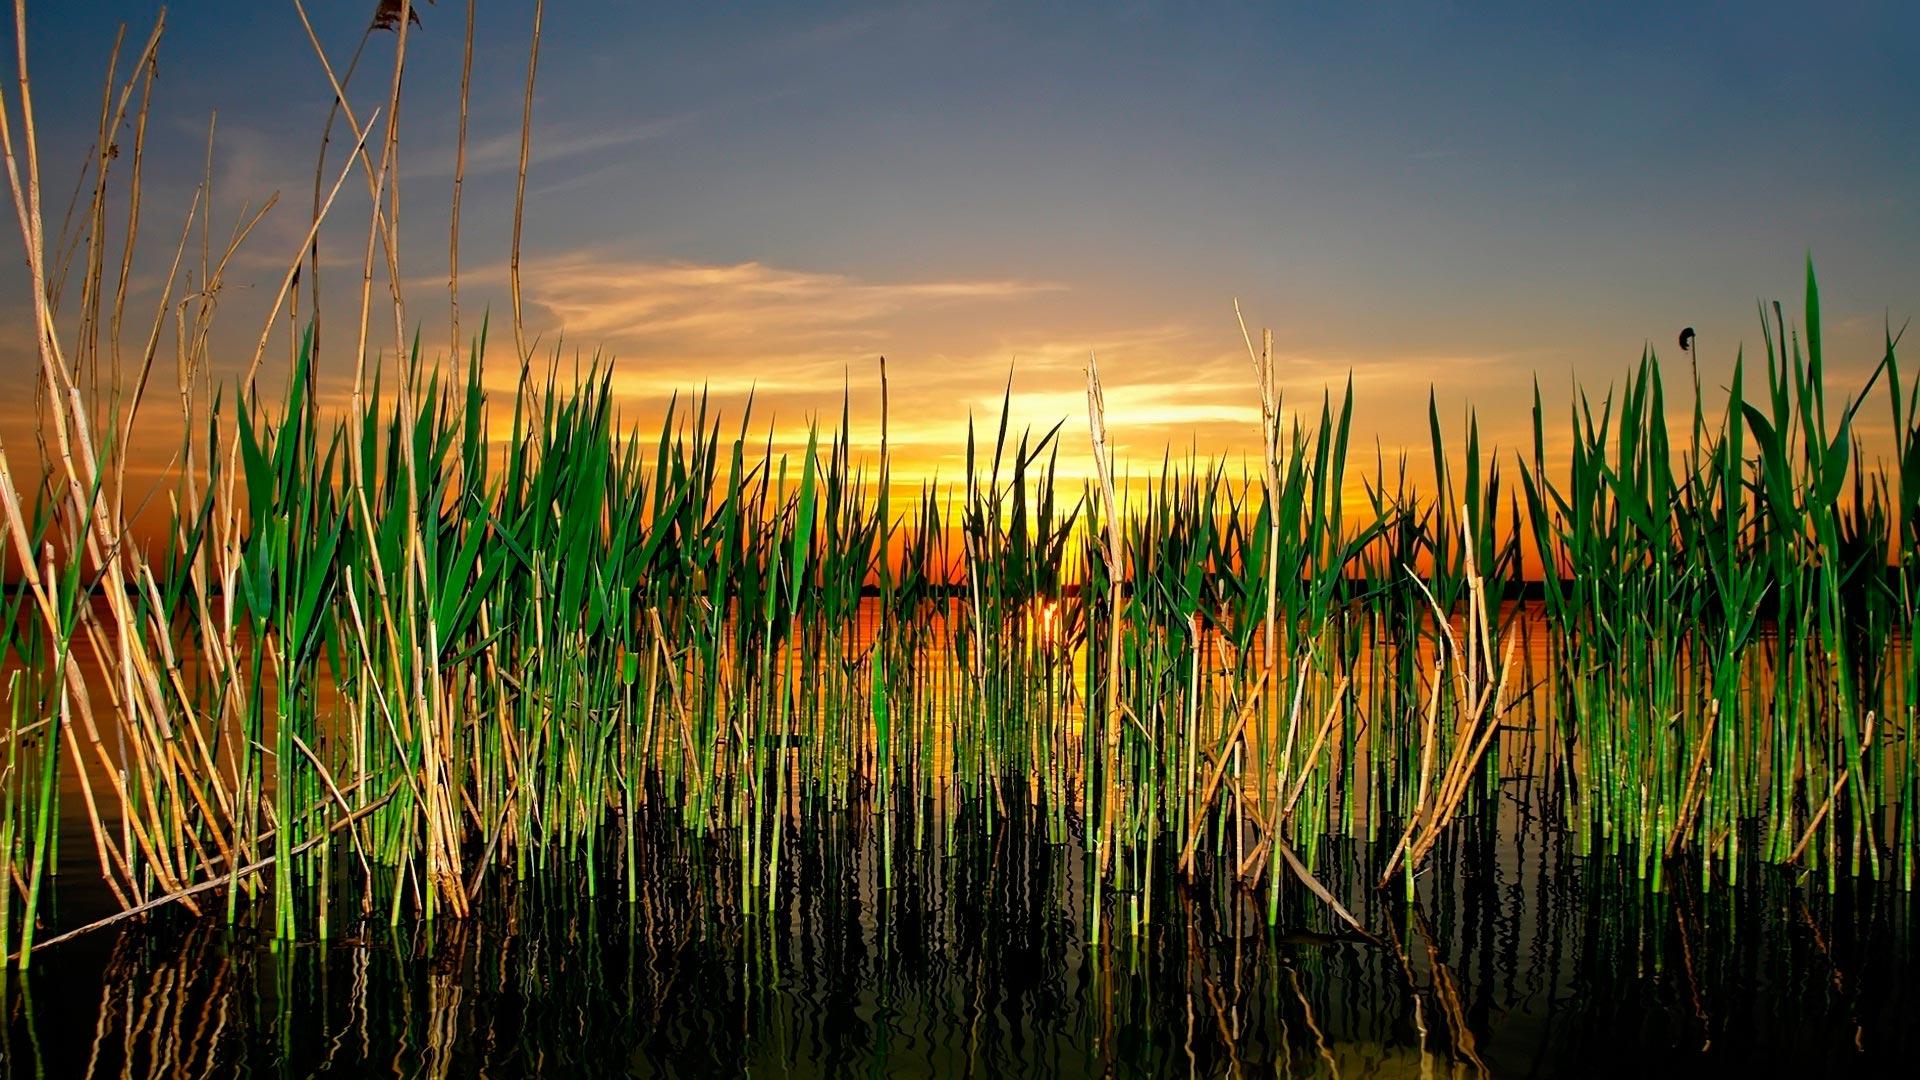 пристань трава озеро небо смотреть